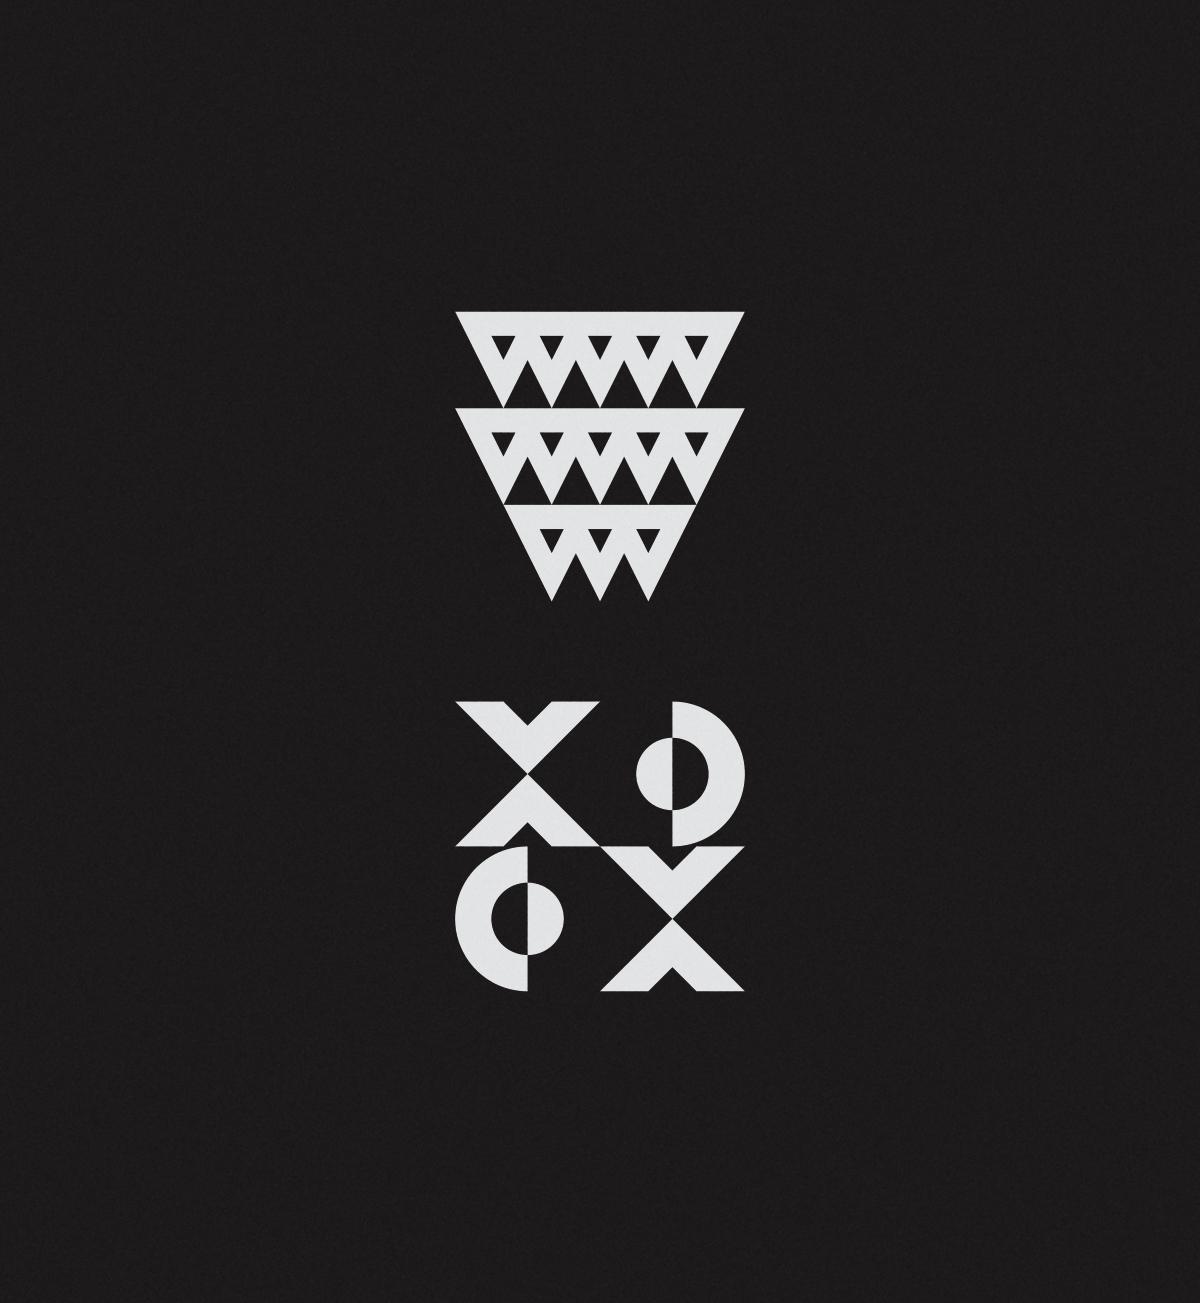 TBS_NF_TheAcademy_Symbols_v1